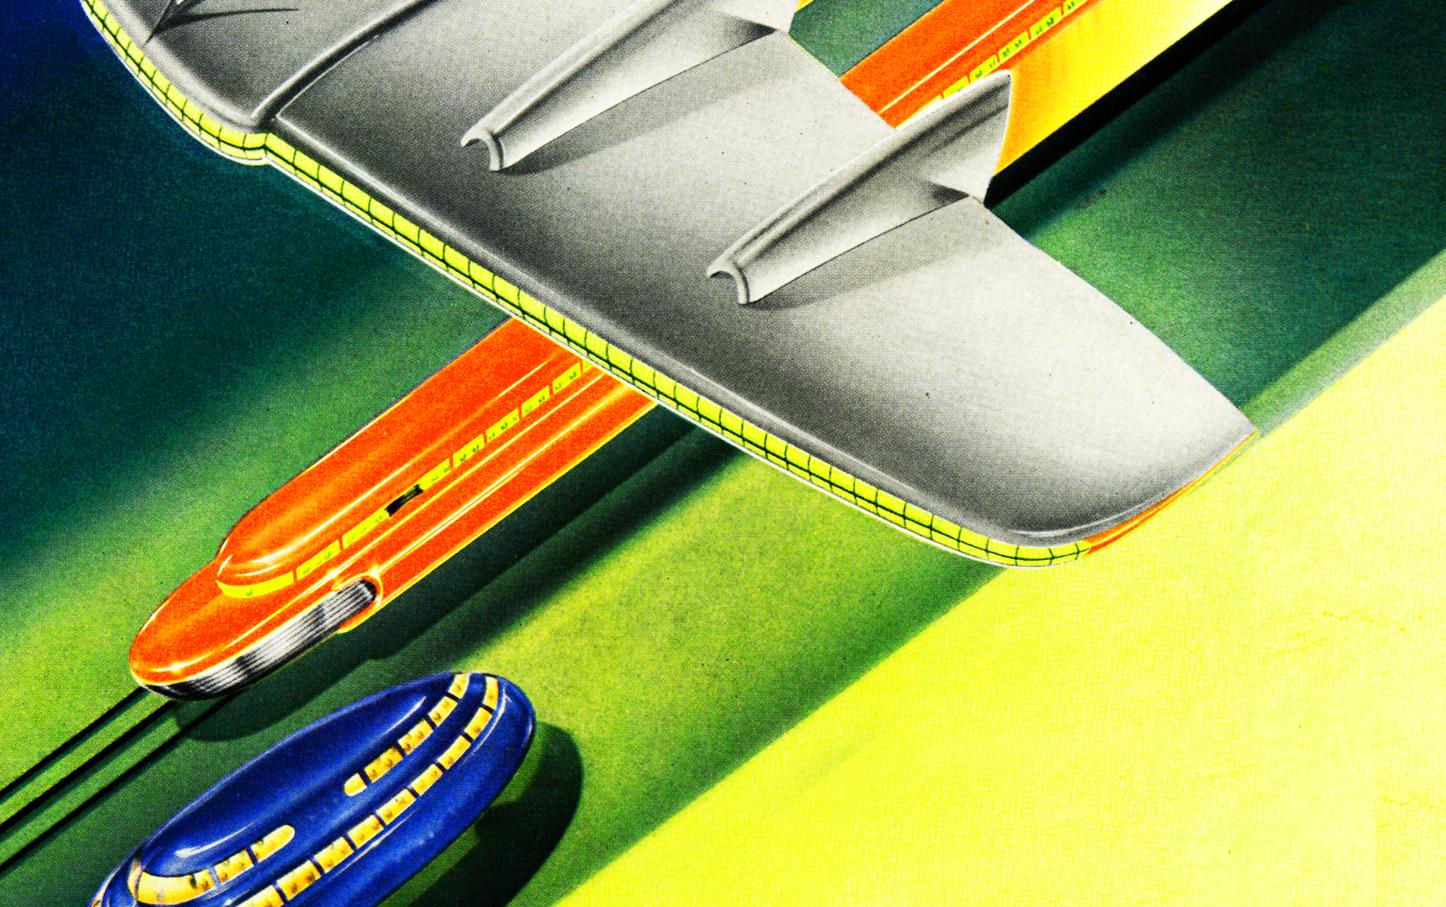 graphic retro streamlined art deco vintage airbrush futuristic space 1446x907